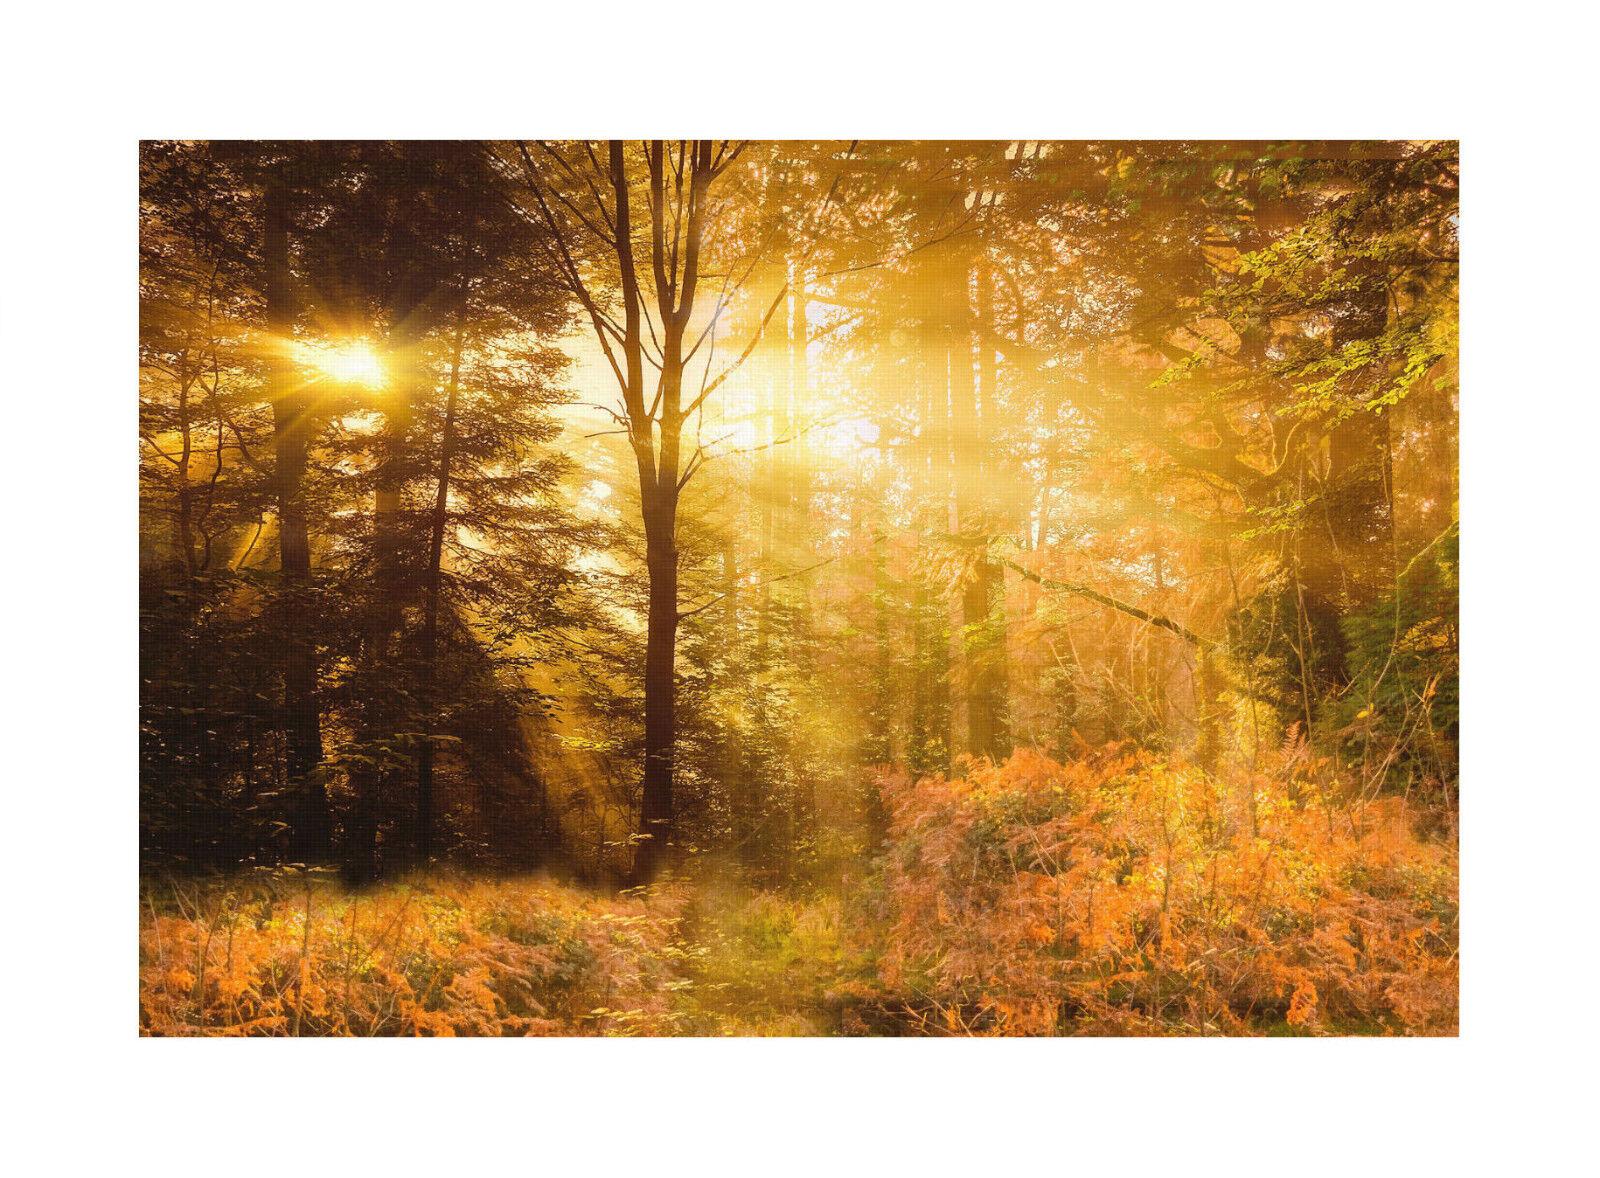 Wald Premium Leinwand Leinwand Leinwand   Keilrahmen Bild Wandbild Bäume Landschaft   M2 74c70b